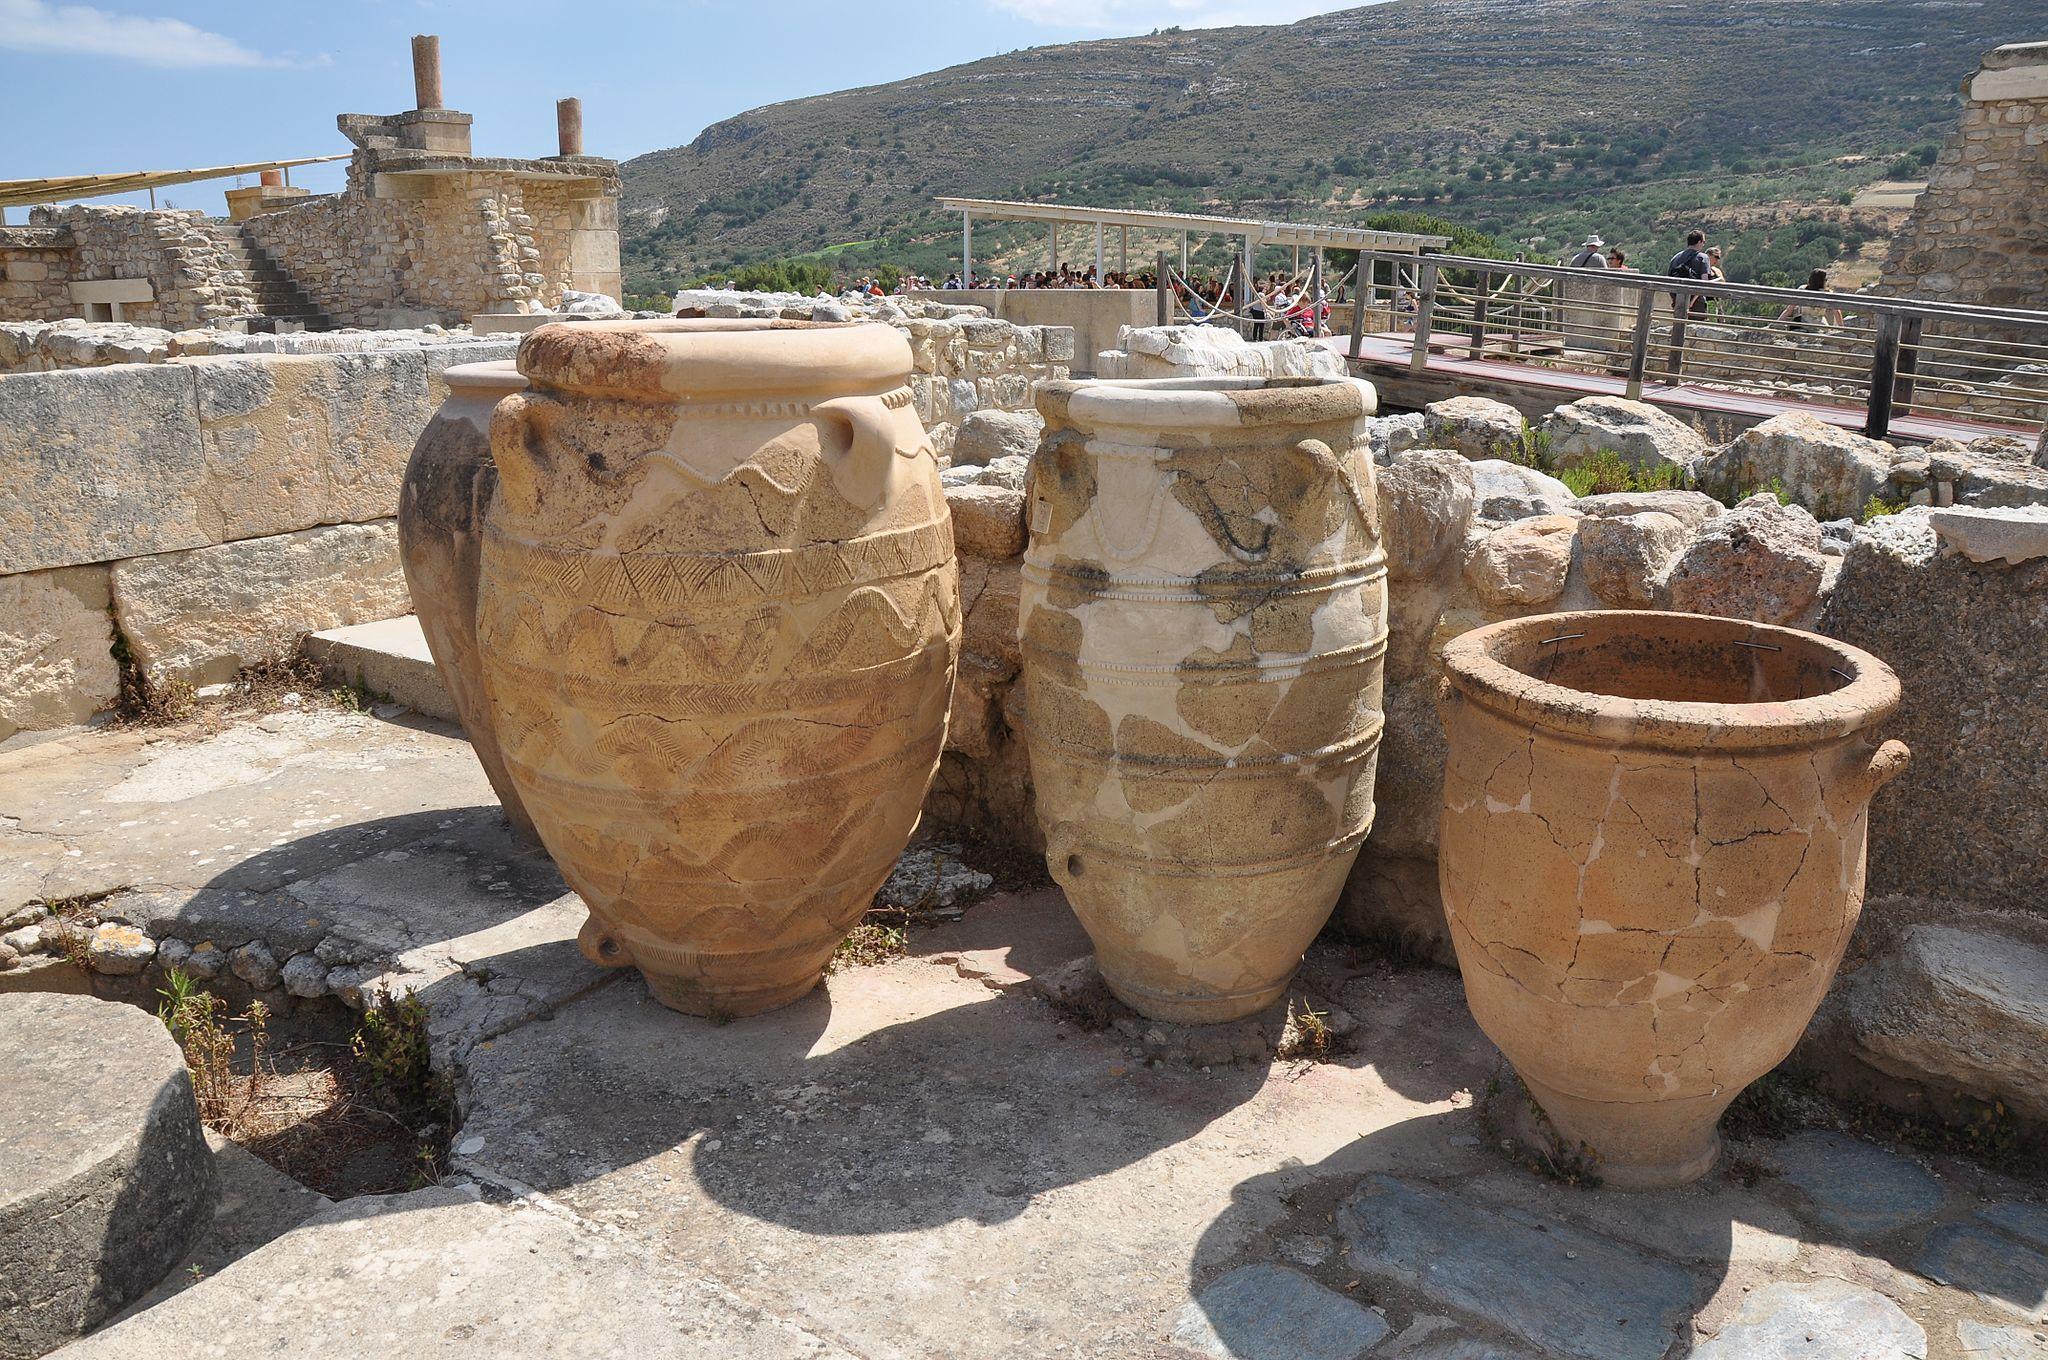 Knossos_pithoi_pottery,_Crete_001.JPG